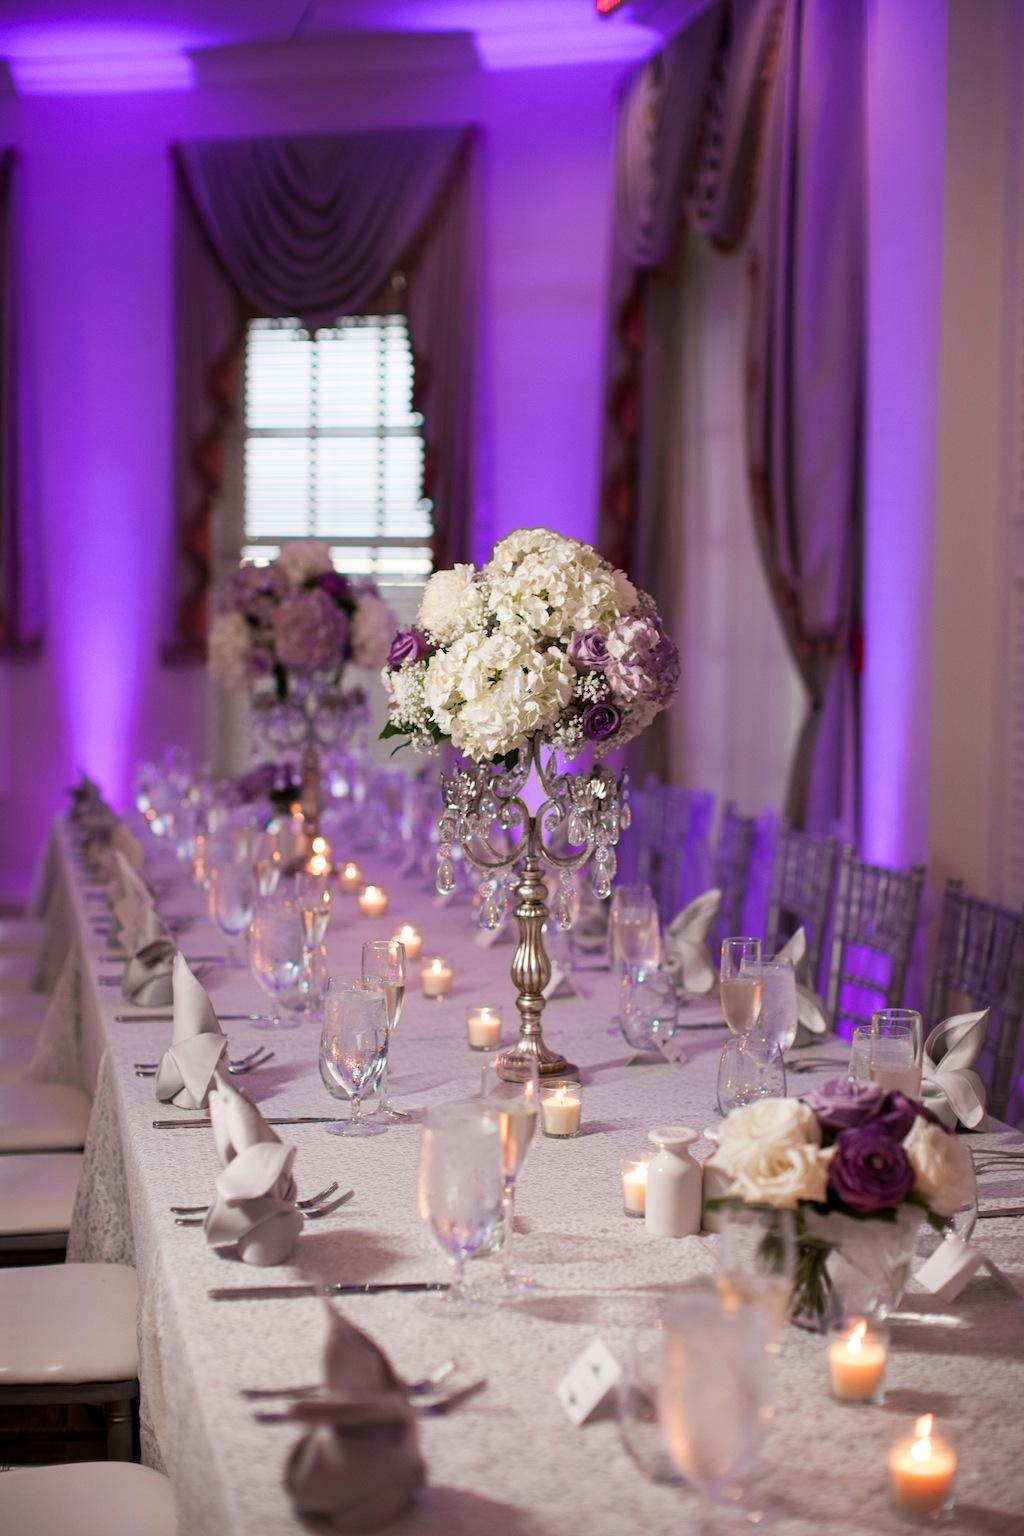 Brooksville Wedding - Purple, Silver & Ivory Wedding at Southern Hills Plantation Club - Brooksville Wedding Photographer Blue Lane Studios (55)